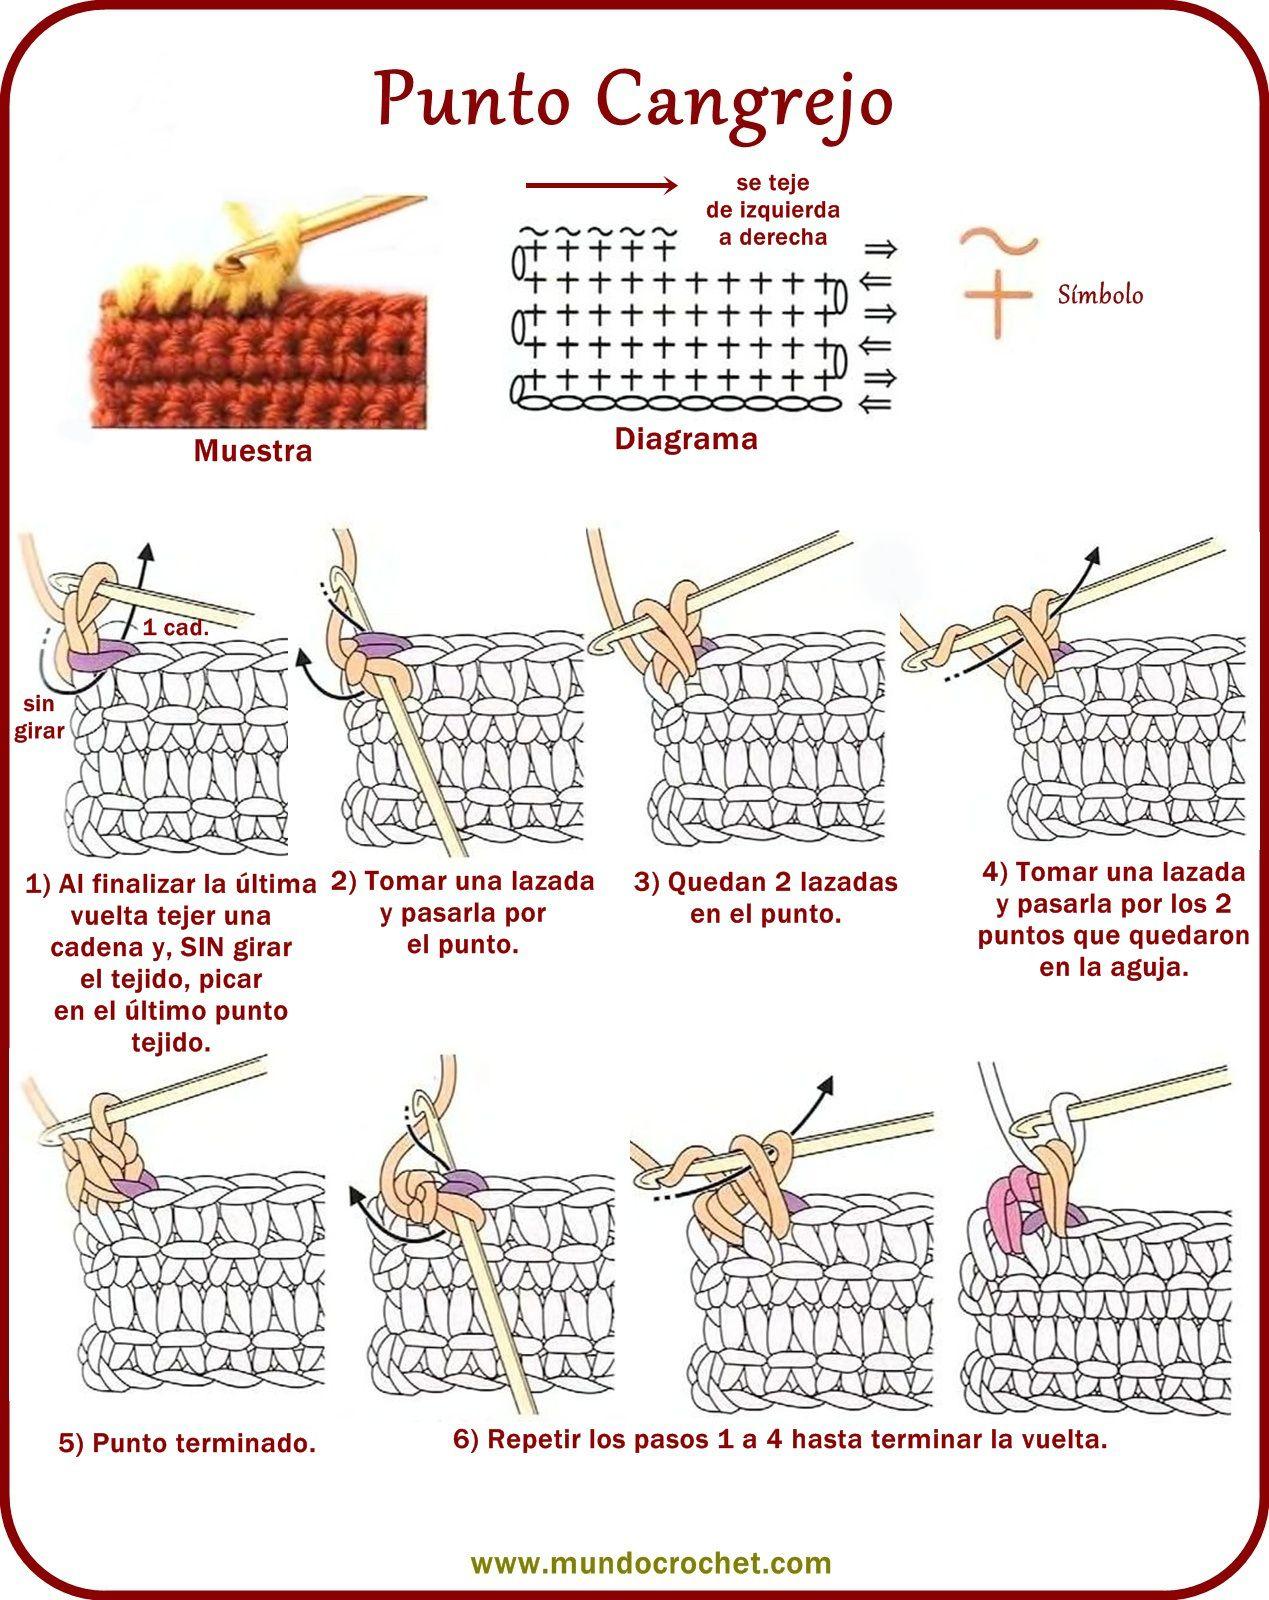 Punto cangrejo - Reverse single crochet - вязание крючком пунктов ...